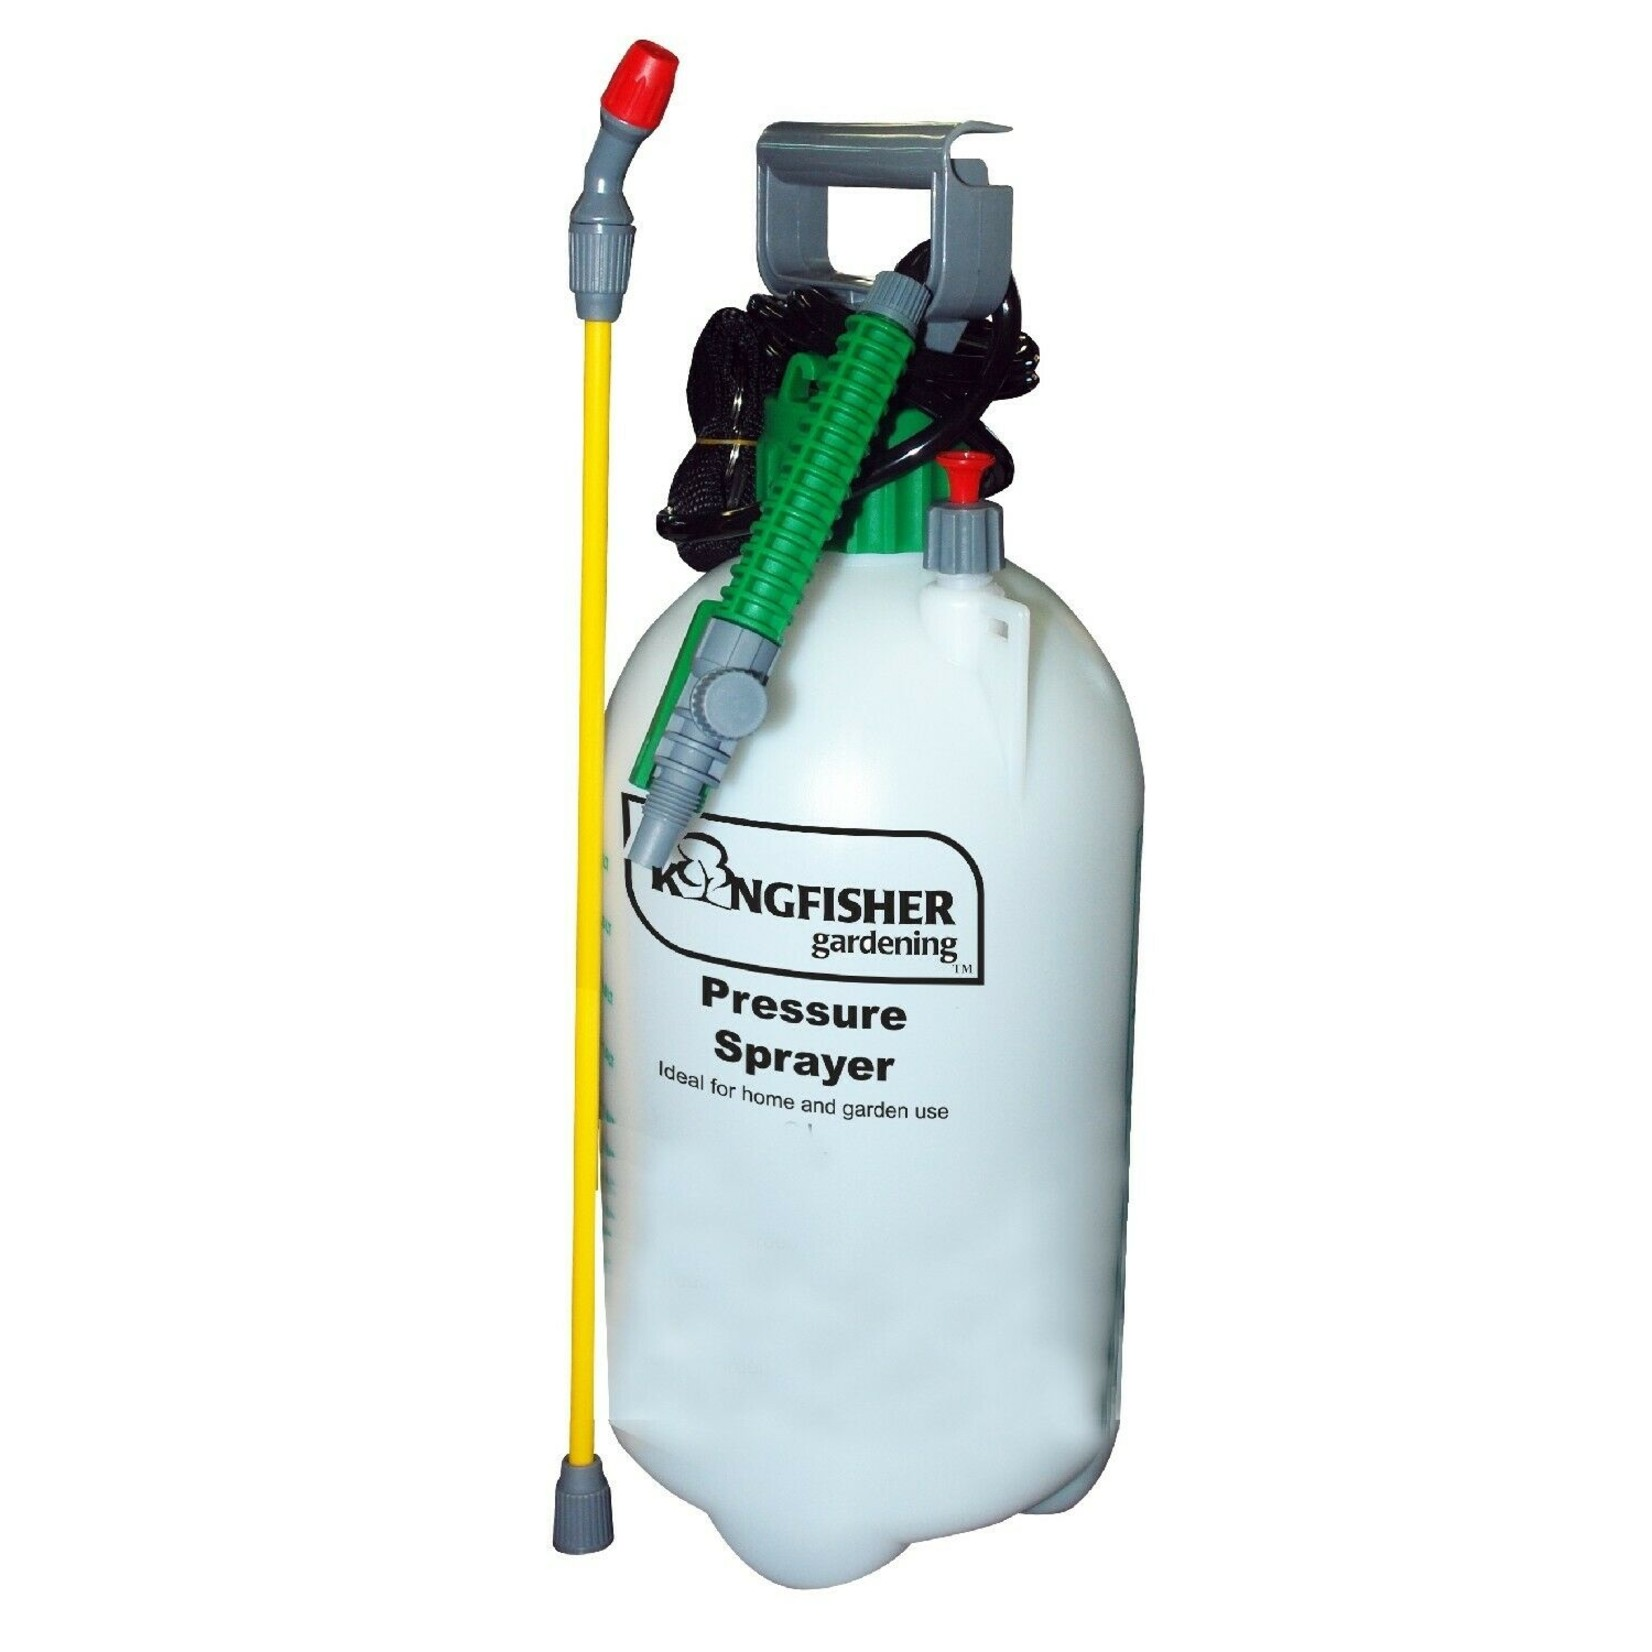 KingFisher 8 litre Pump Action Pressure Sprayer